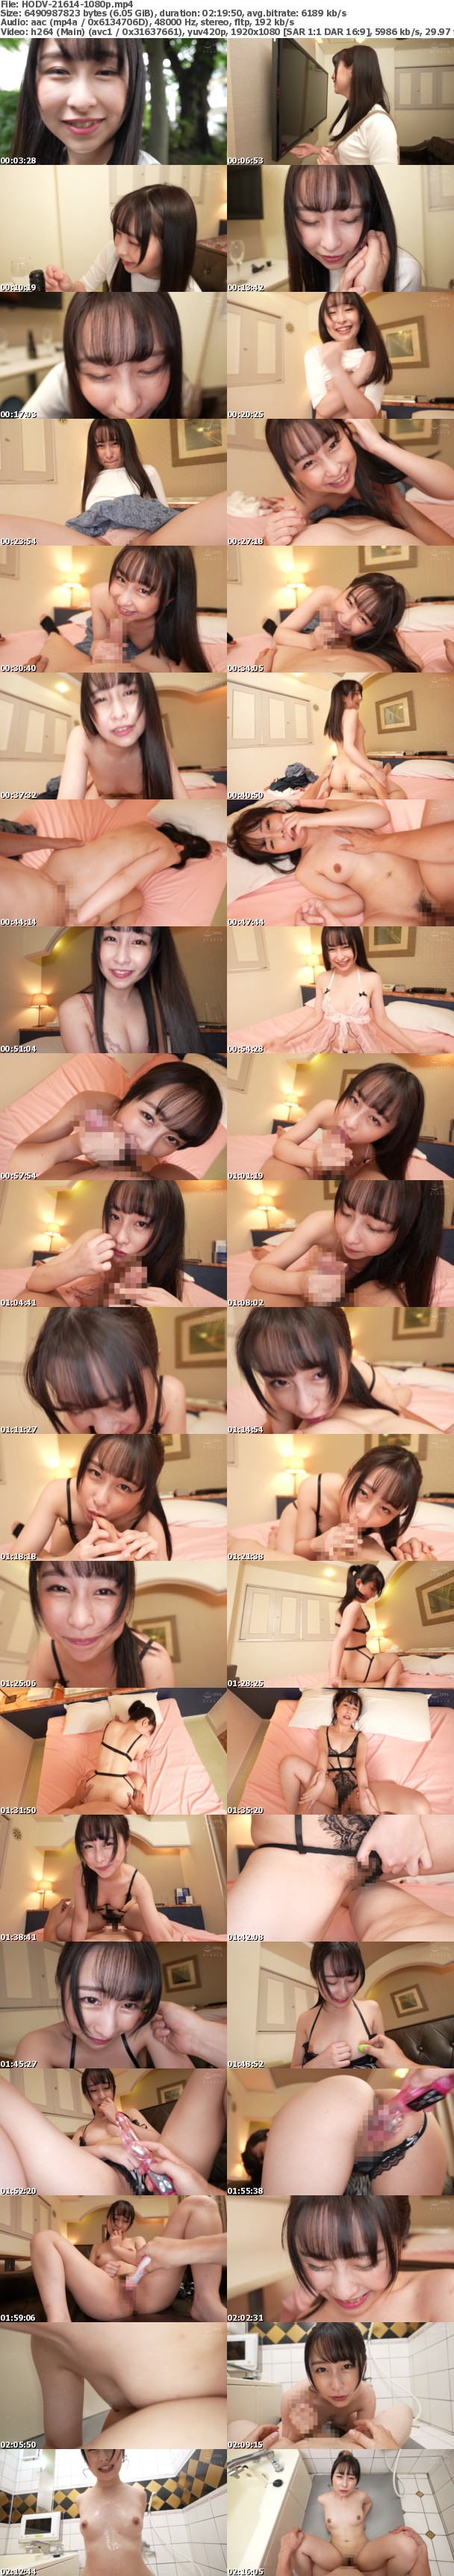 (Full HD) HODV-21614 【完全主観】方言女子 奈良弁 成田つむぎ